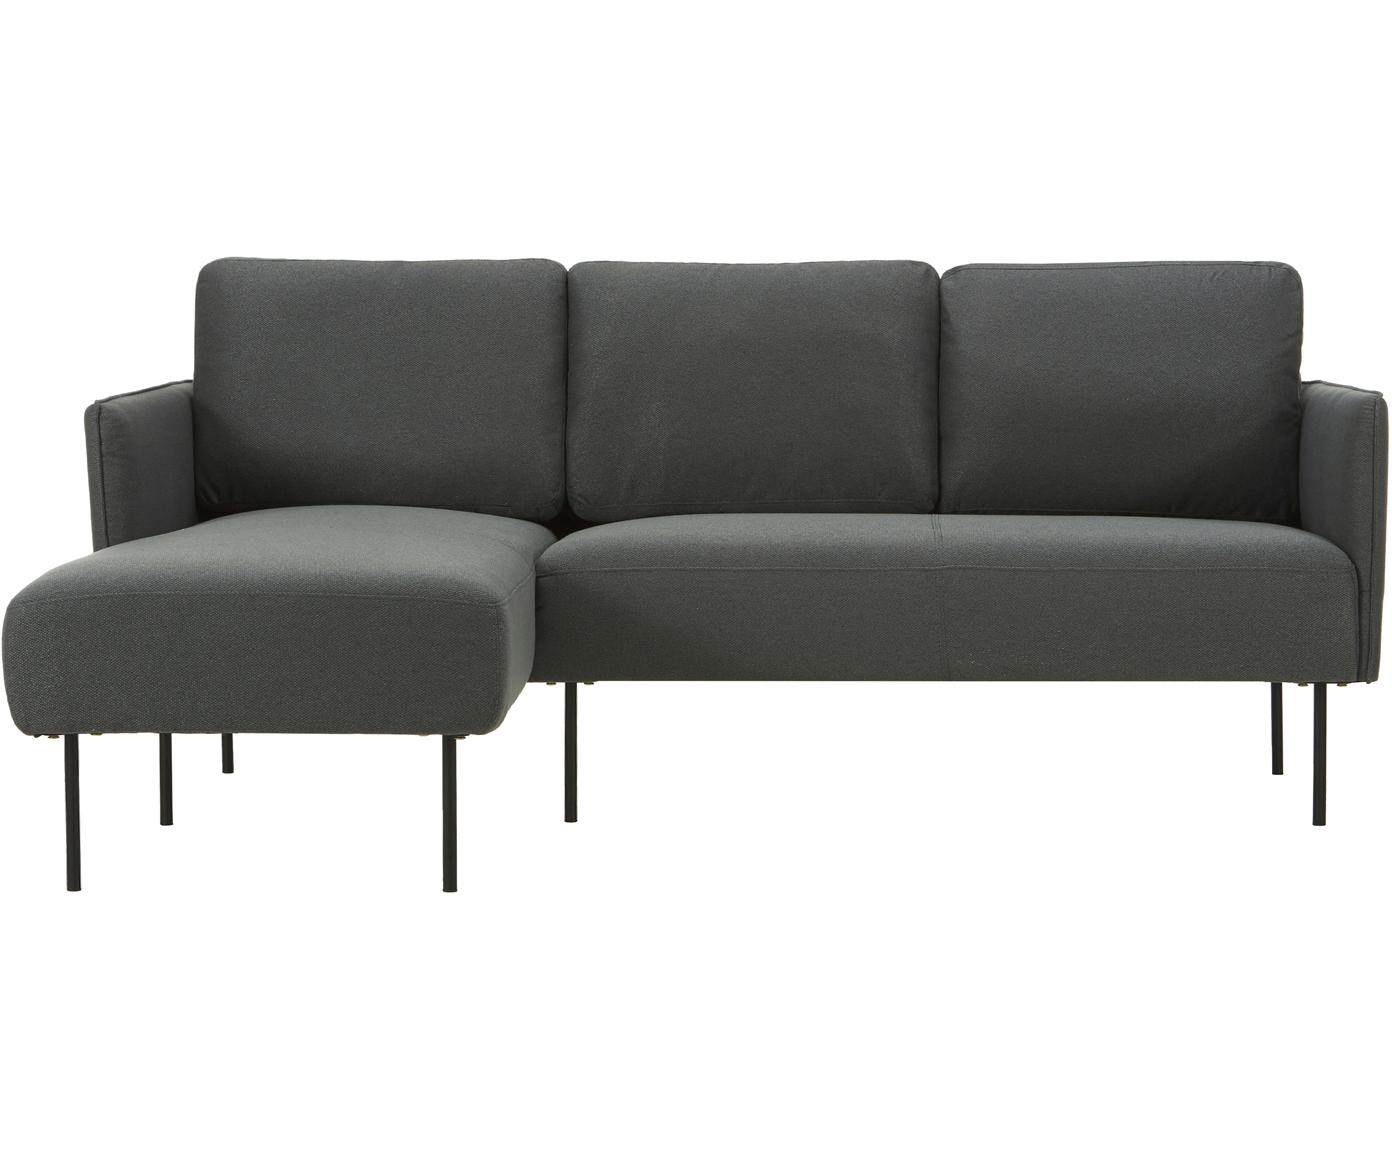 Ecksofa Ramira, Bezug: Polyester 20.000 Scheuert, Gestell: Massives Kiefernholz, Spe, Webstoff Anthrazit, B 192 x T 136 cm